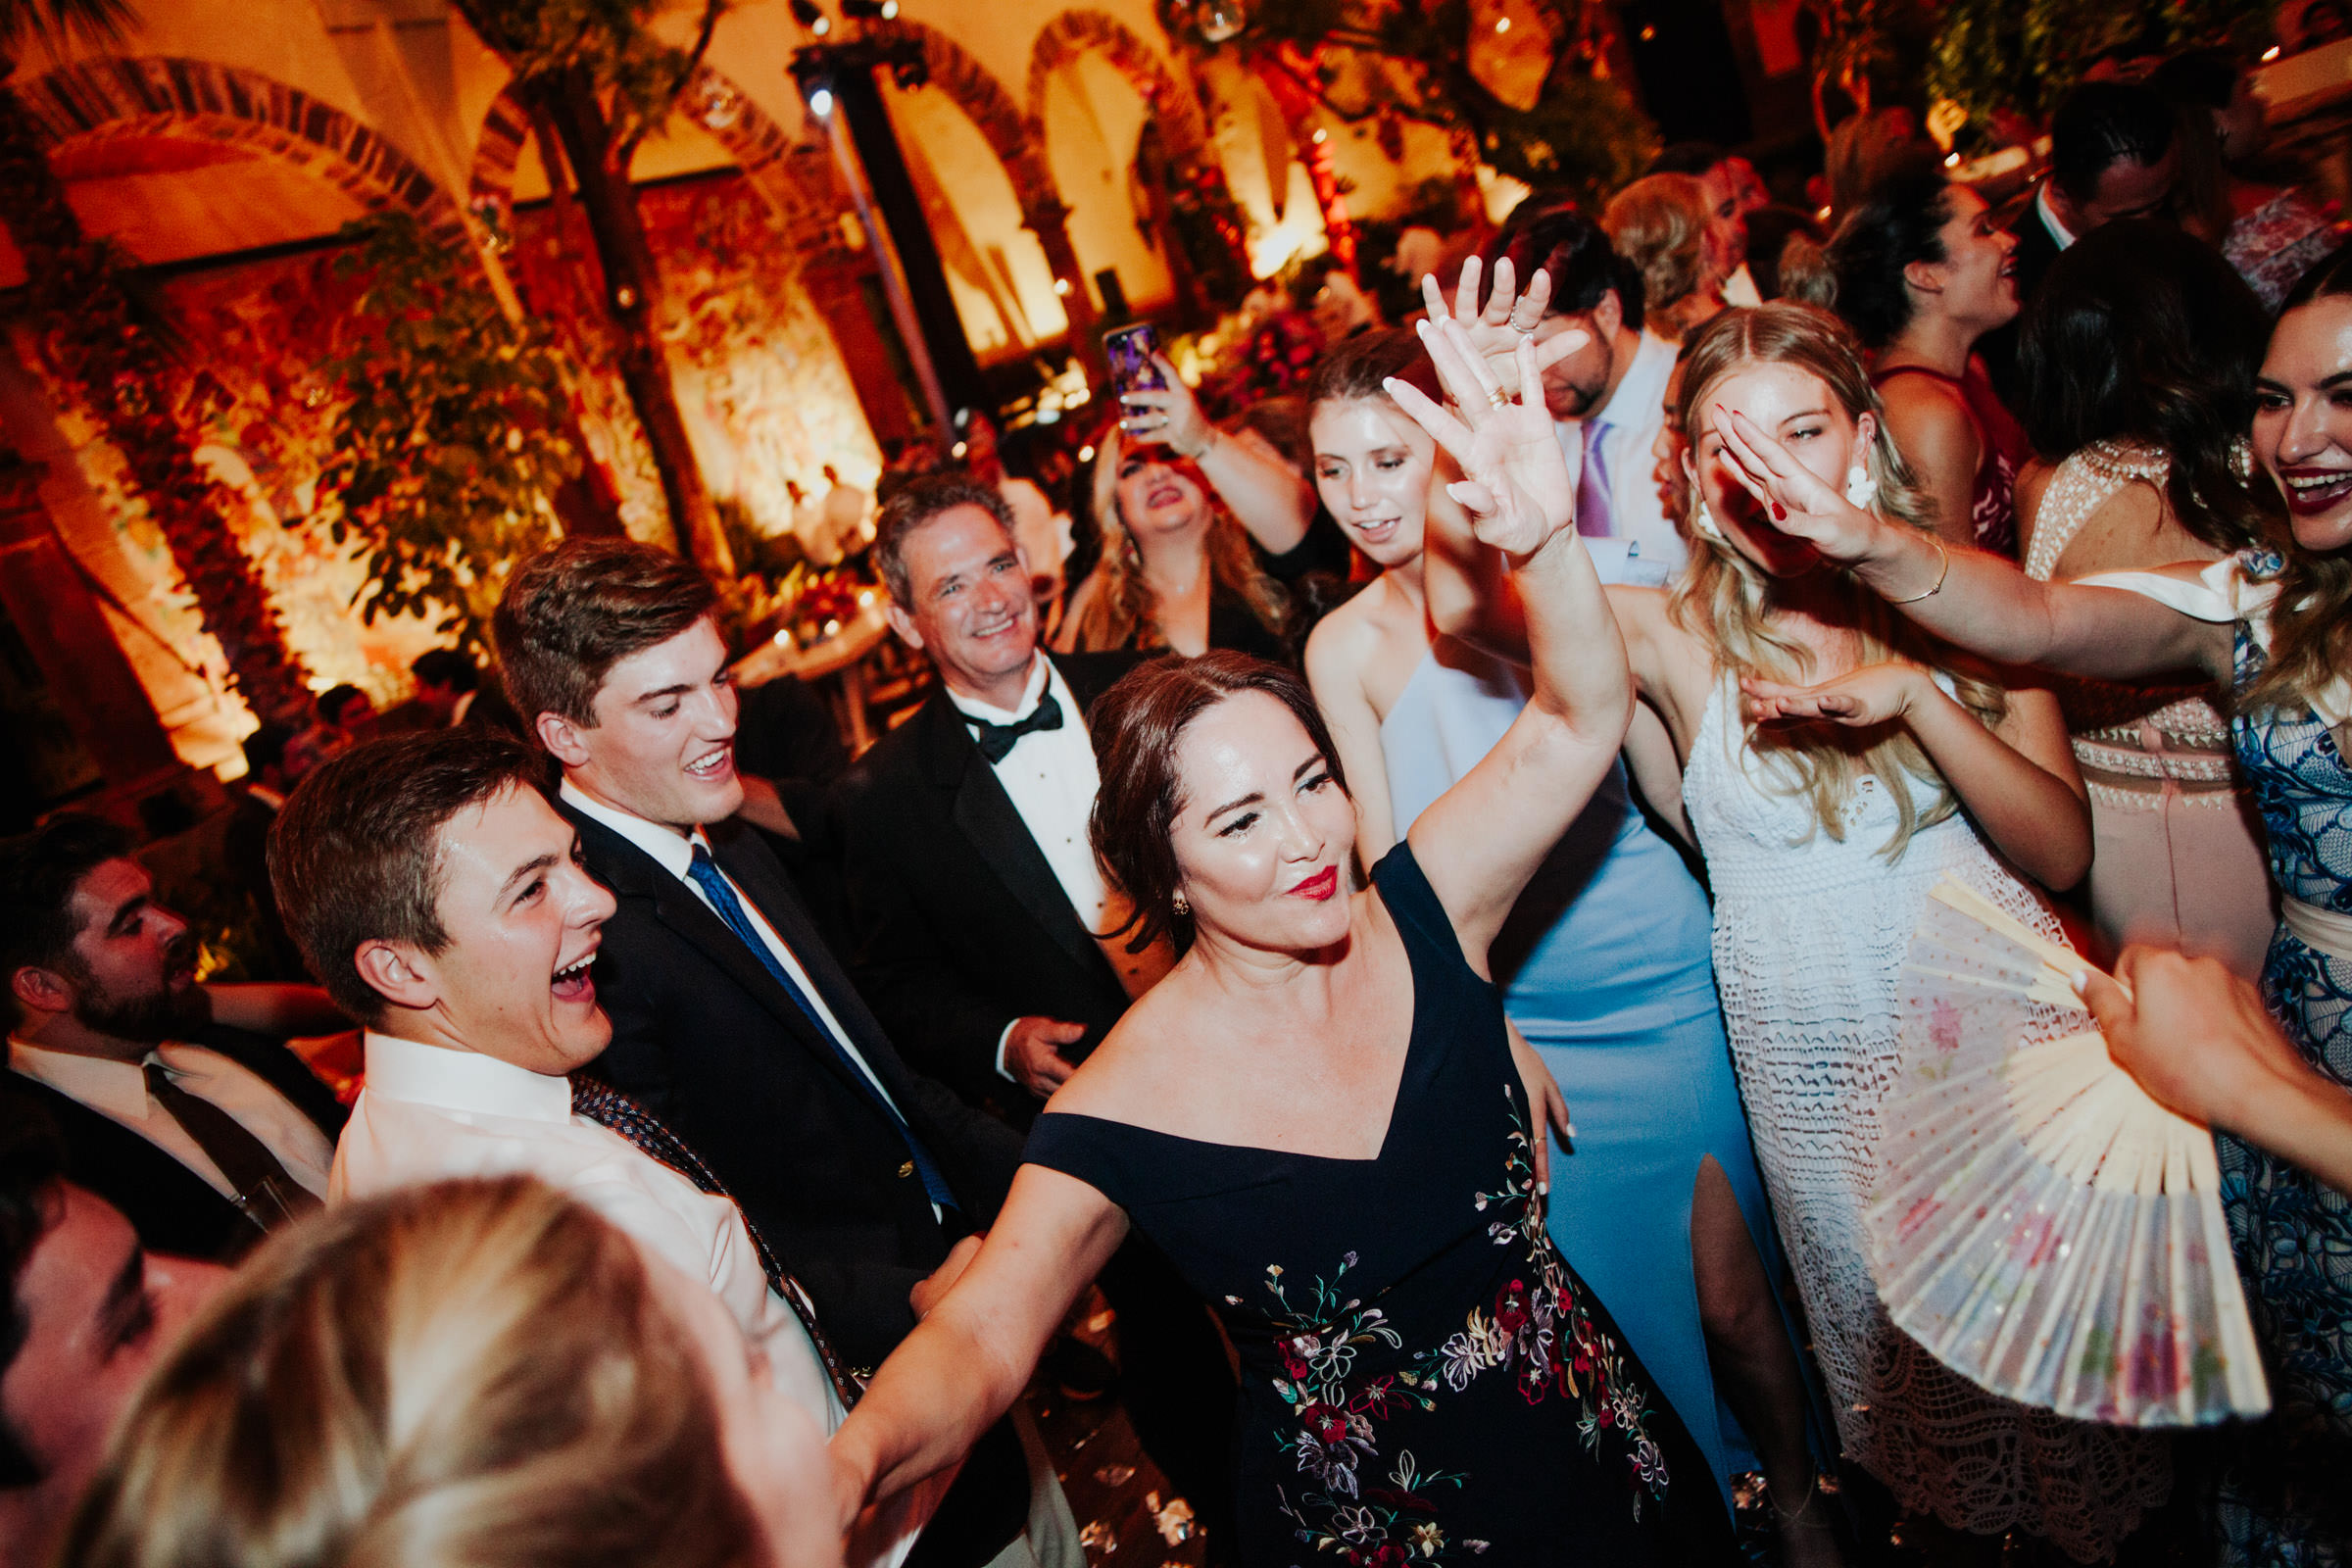 San-Miguel-de-Allende-Wedding-Photography-Parroquia-Instituto-Boda-Fotografia-Fer-Sergio-Pierce-Lifestyle-Photography0060.JPG